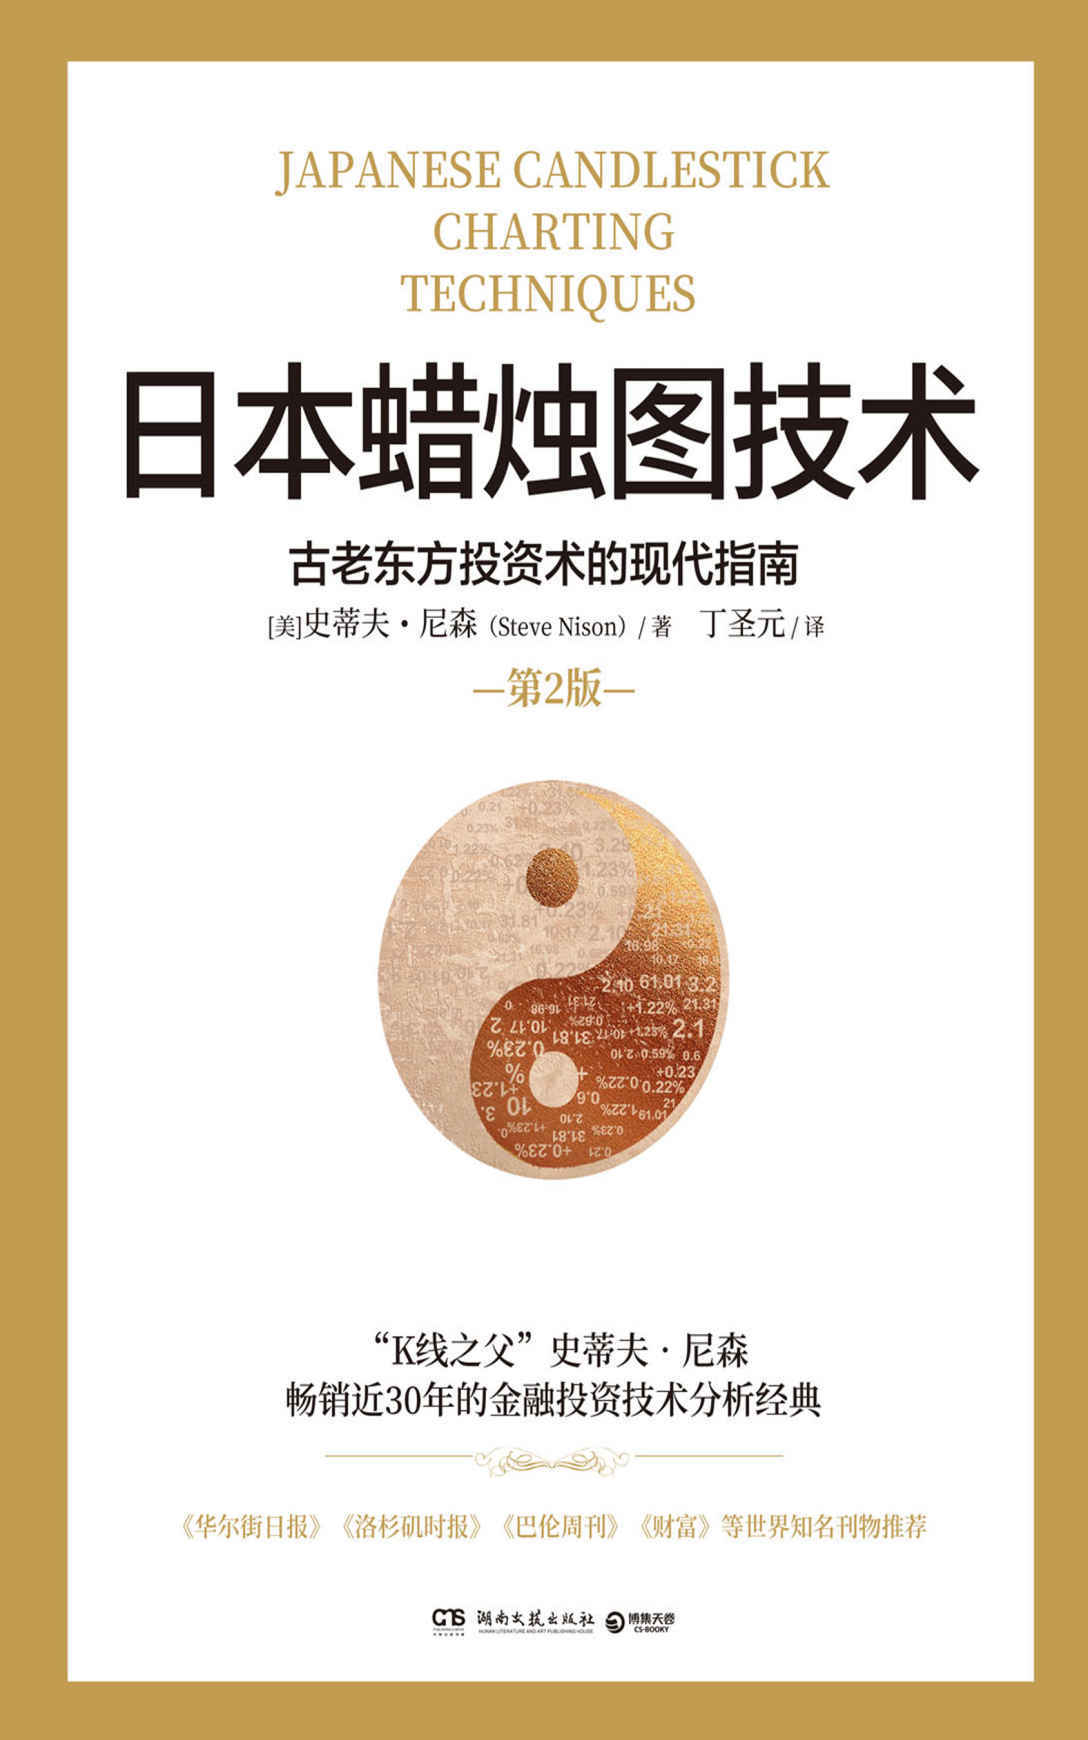 日本蜡烛图技术(第2版)pdf-epub-mobi-txt-azw3